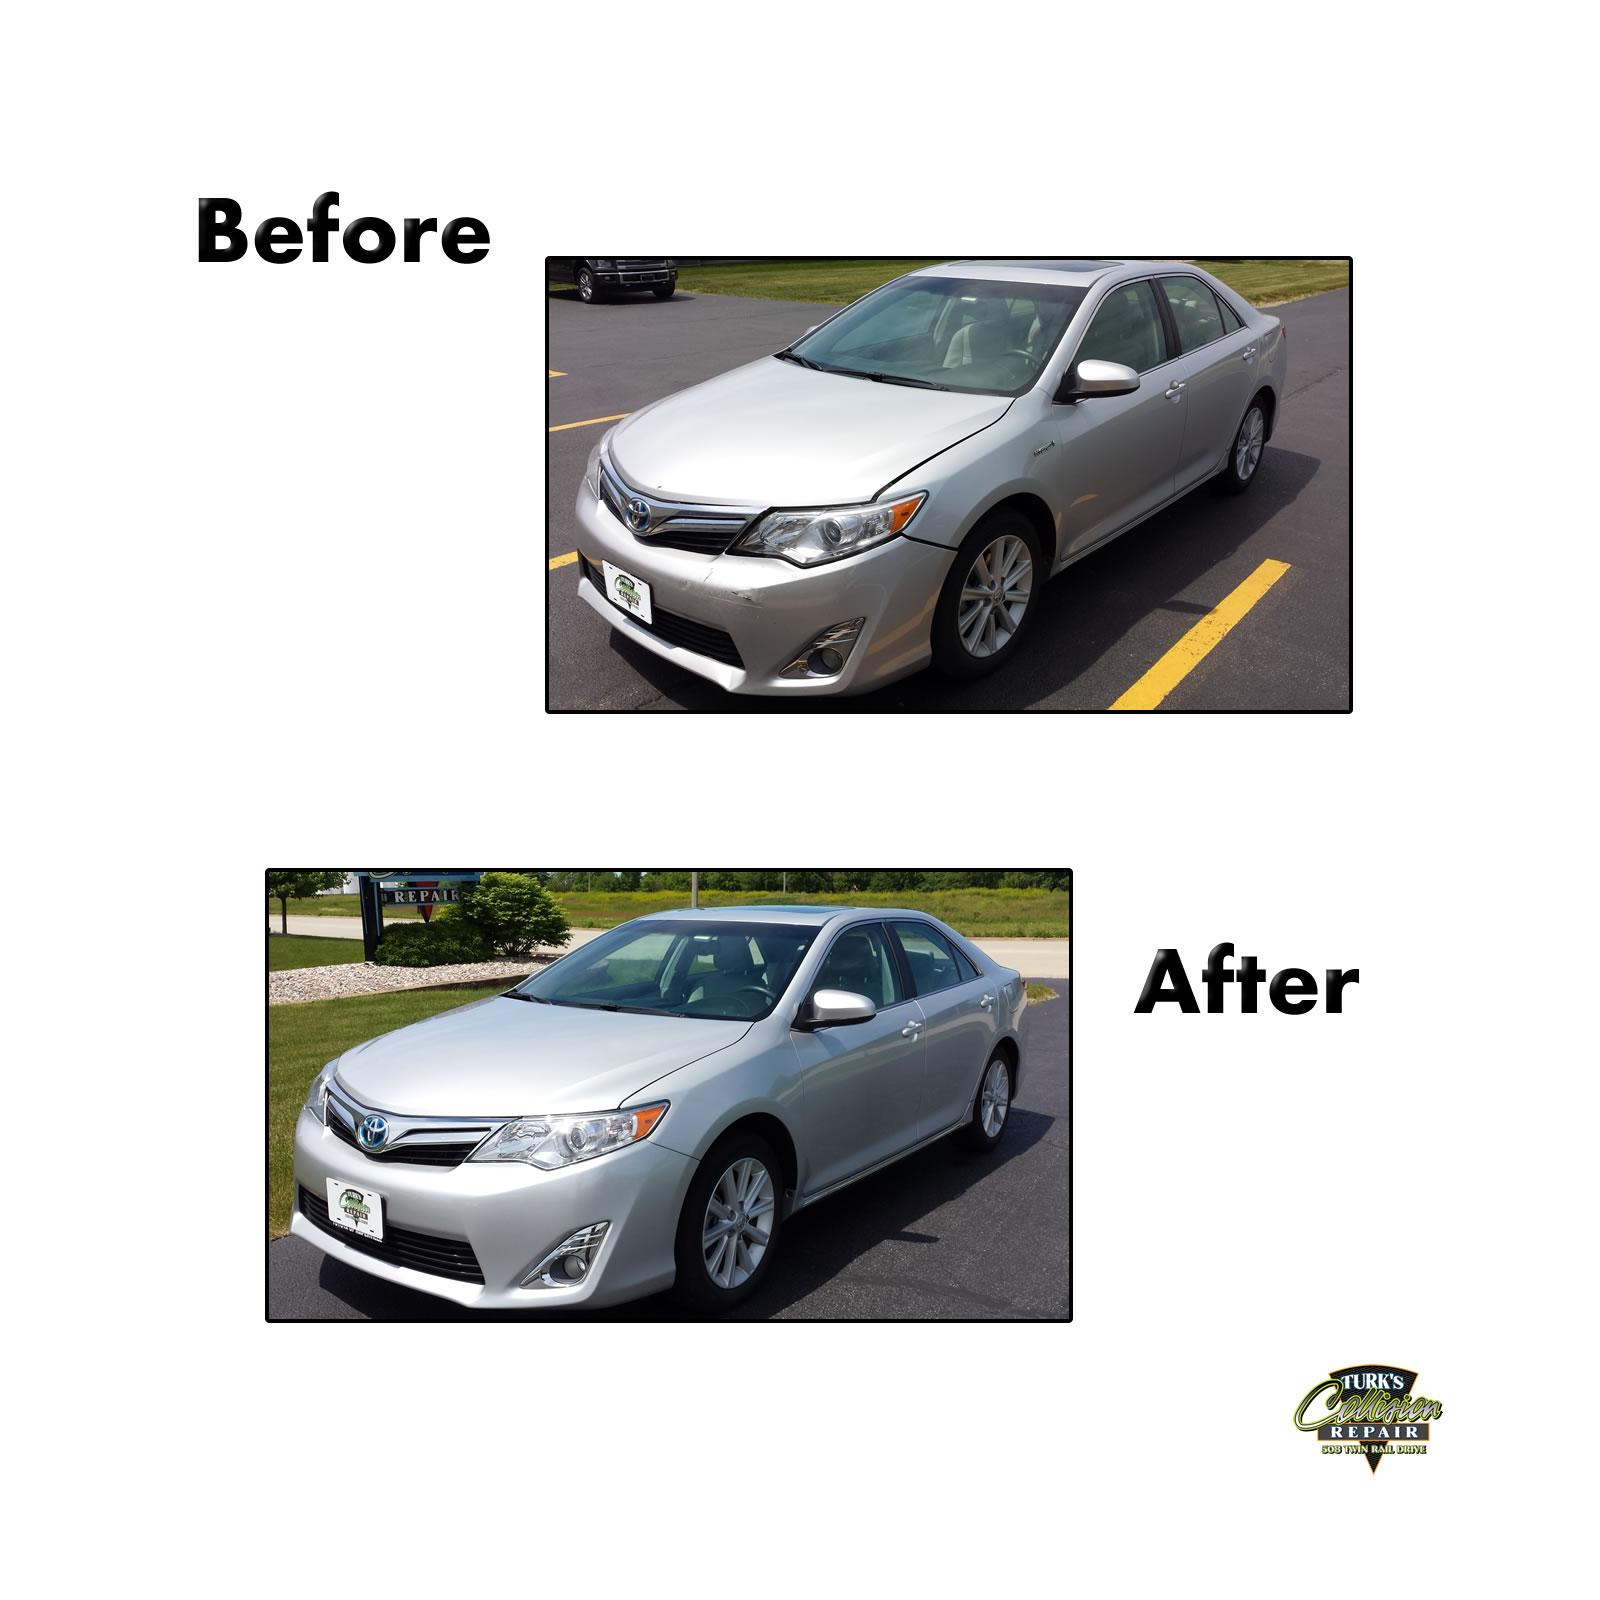 Toyota Camry Collision Repair